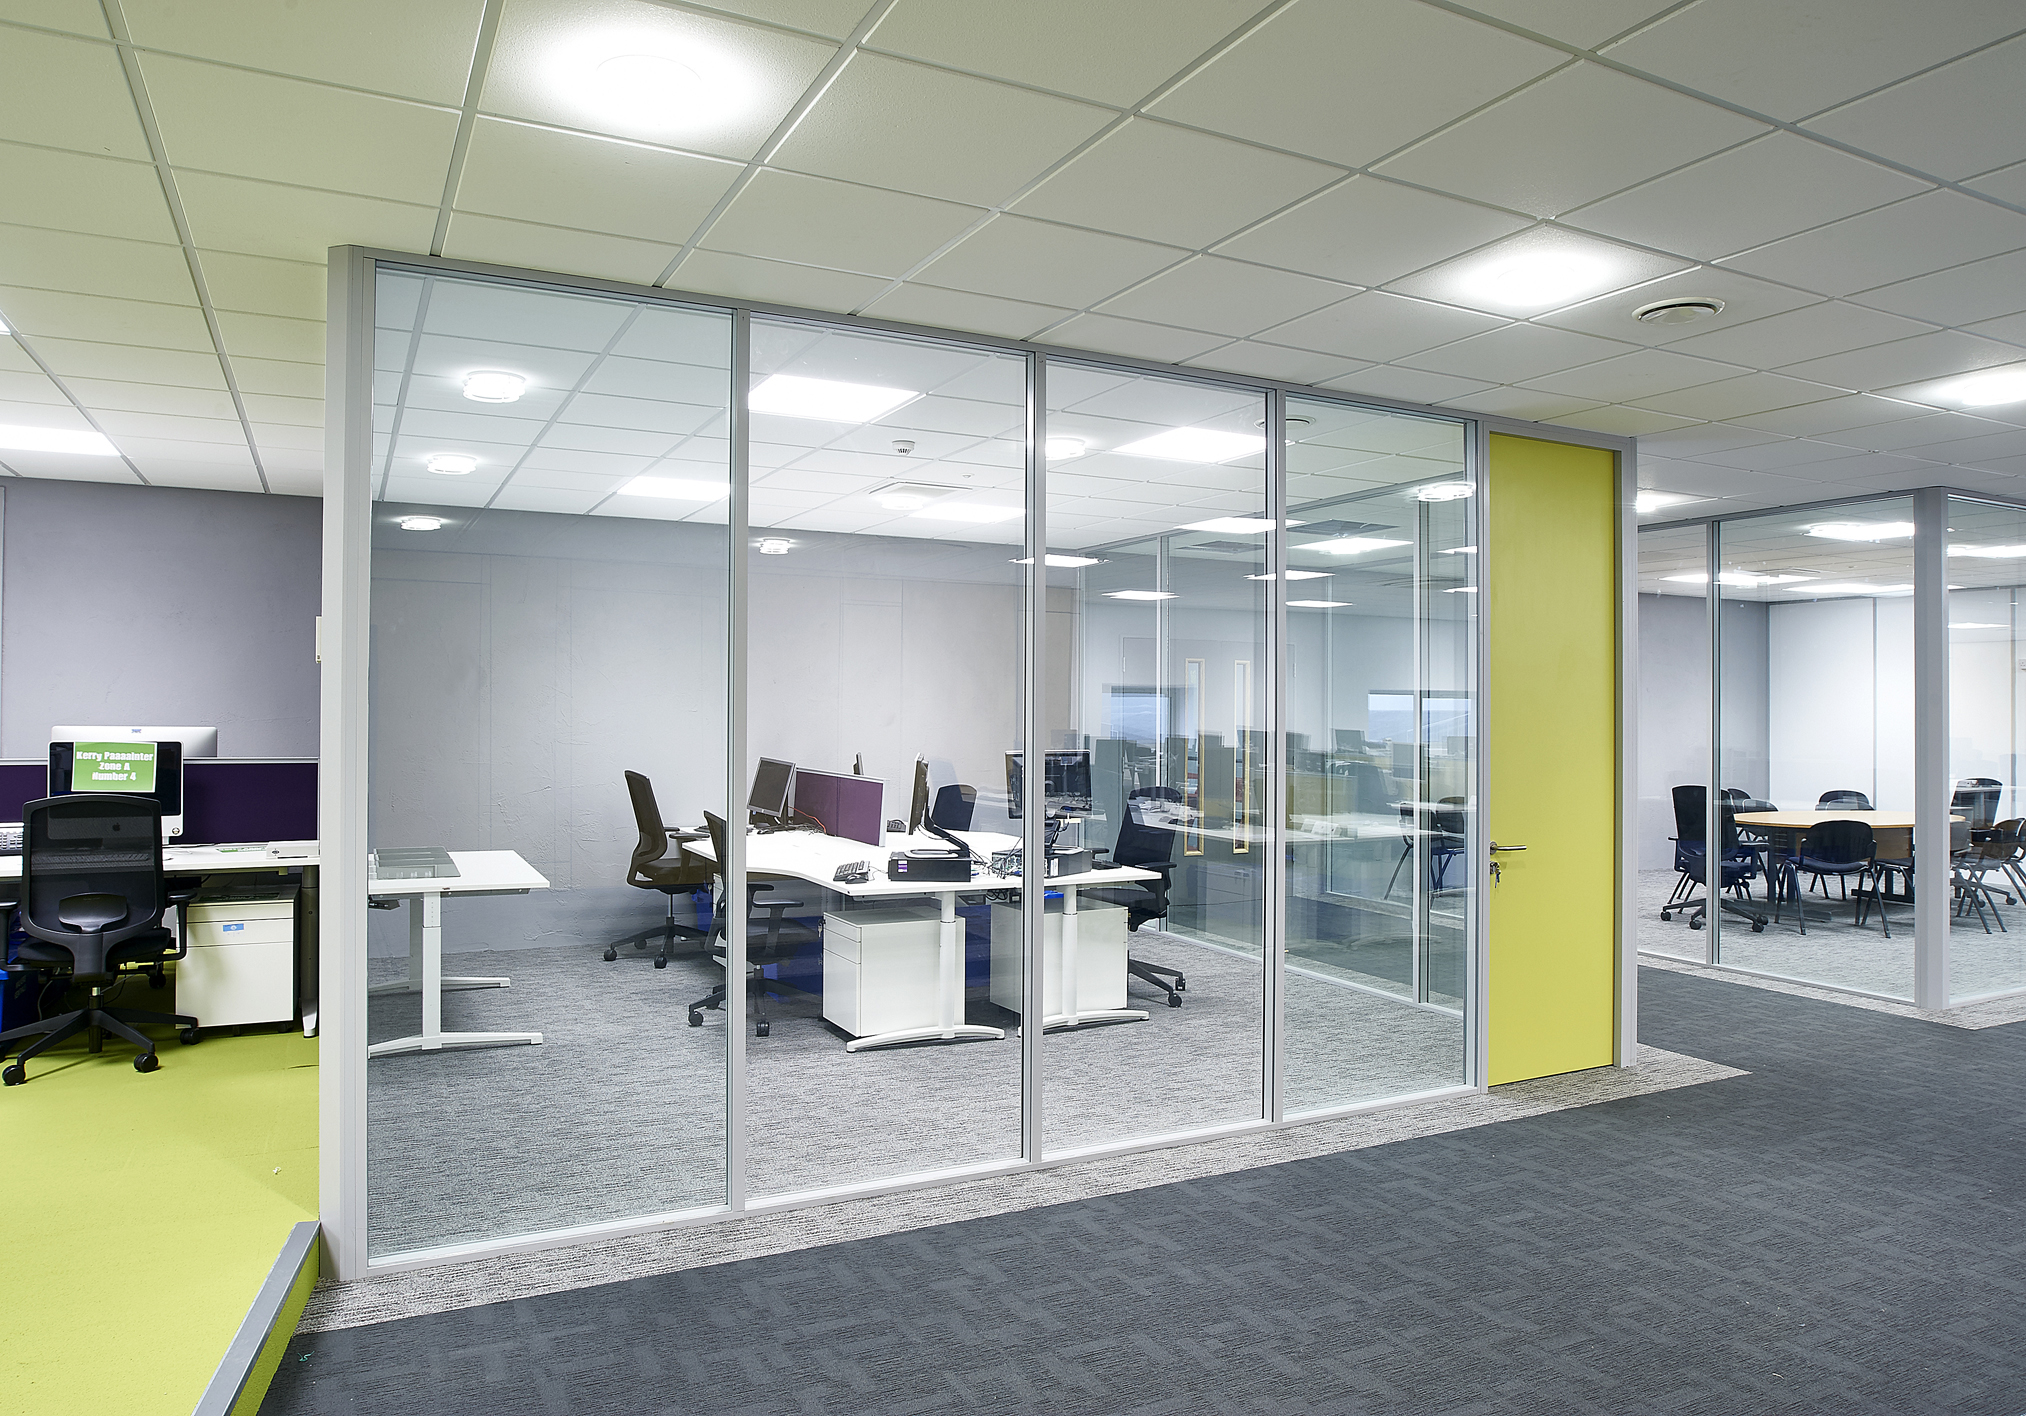 dennisdavis_photography_interiors_office.jpg